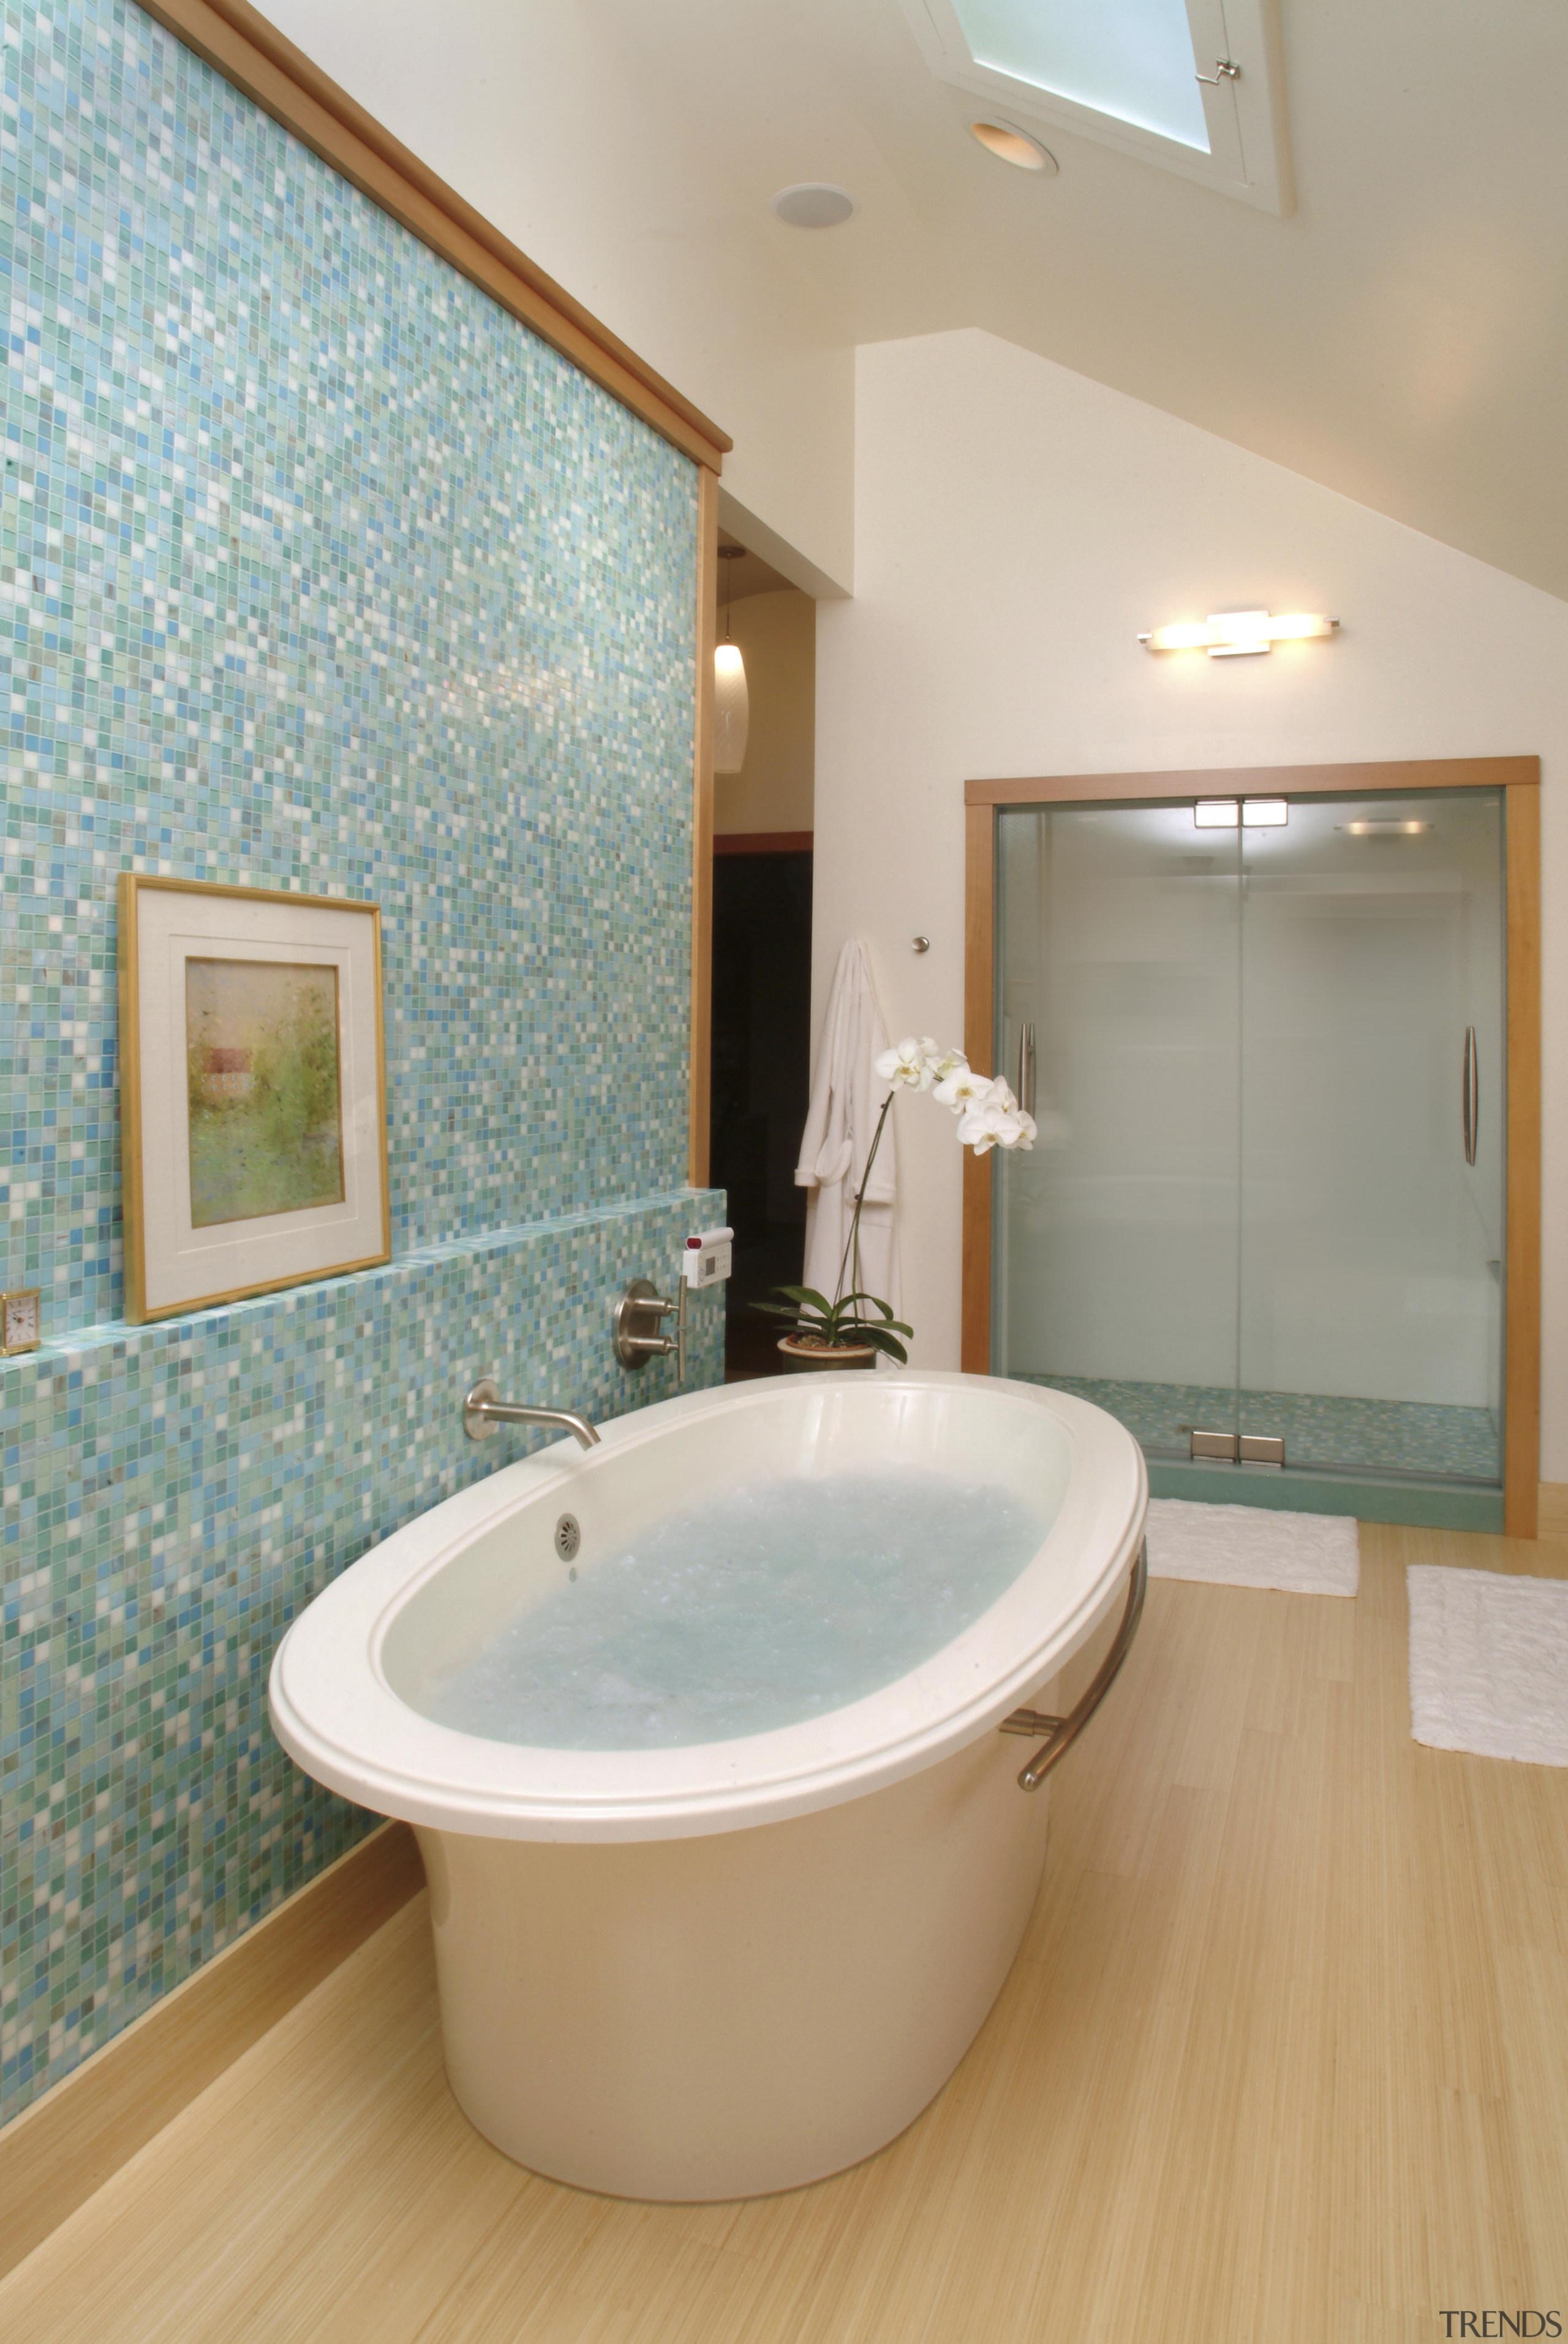 Image of a bathroom designed by an NKBA bathroom, bathtub, floor, flooring, interior design, plumbing fixture, room, tile, toilet seat, gray, orange